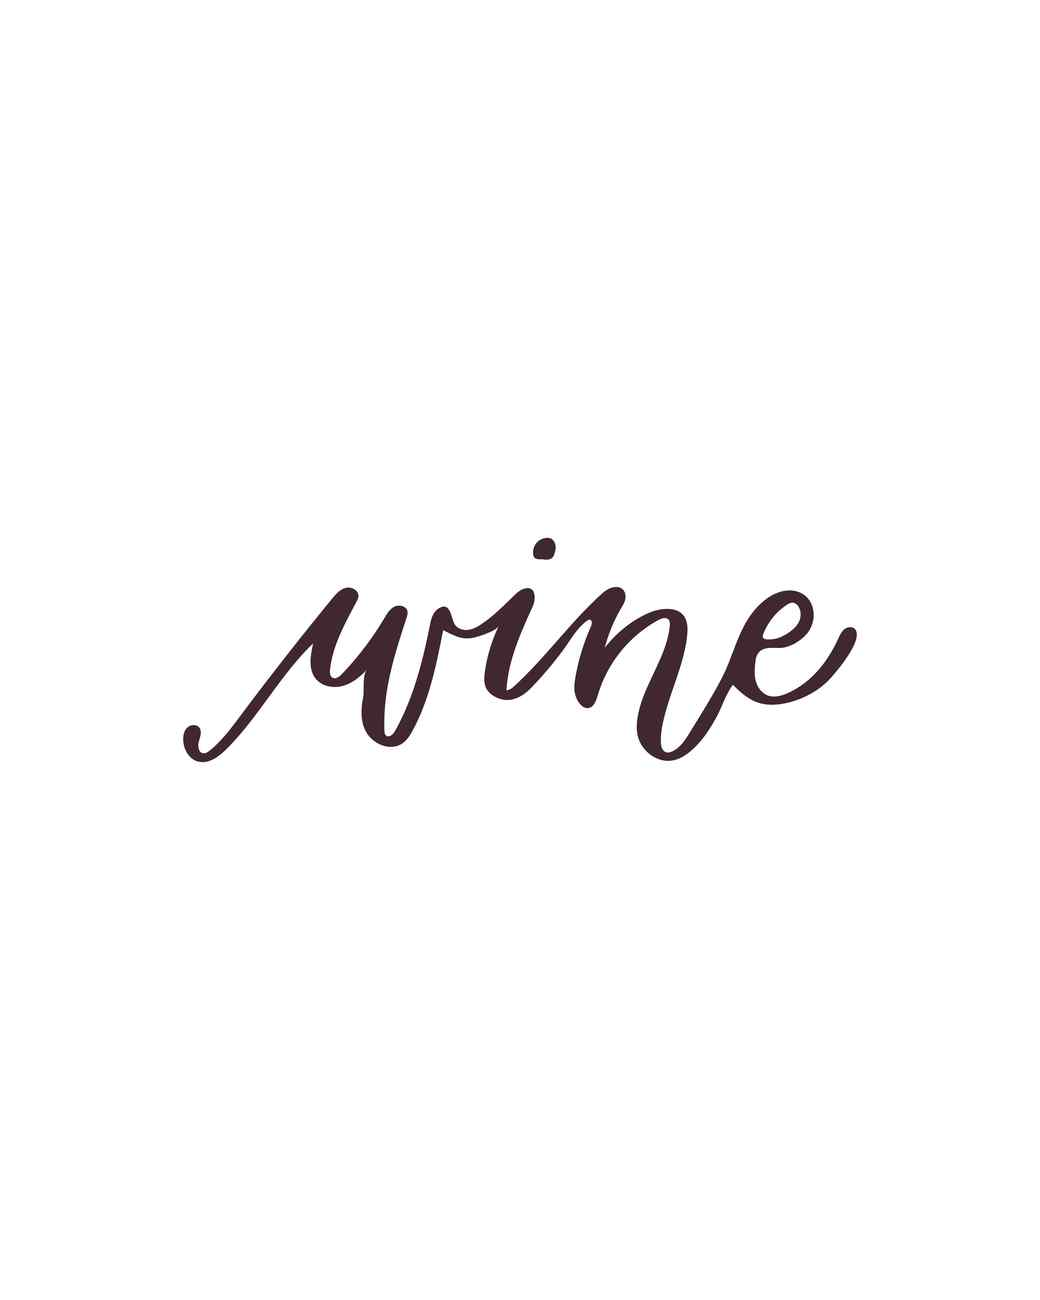 """wine"" calligraphy"